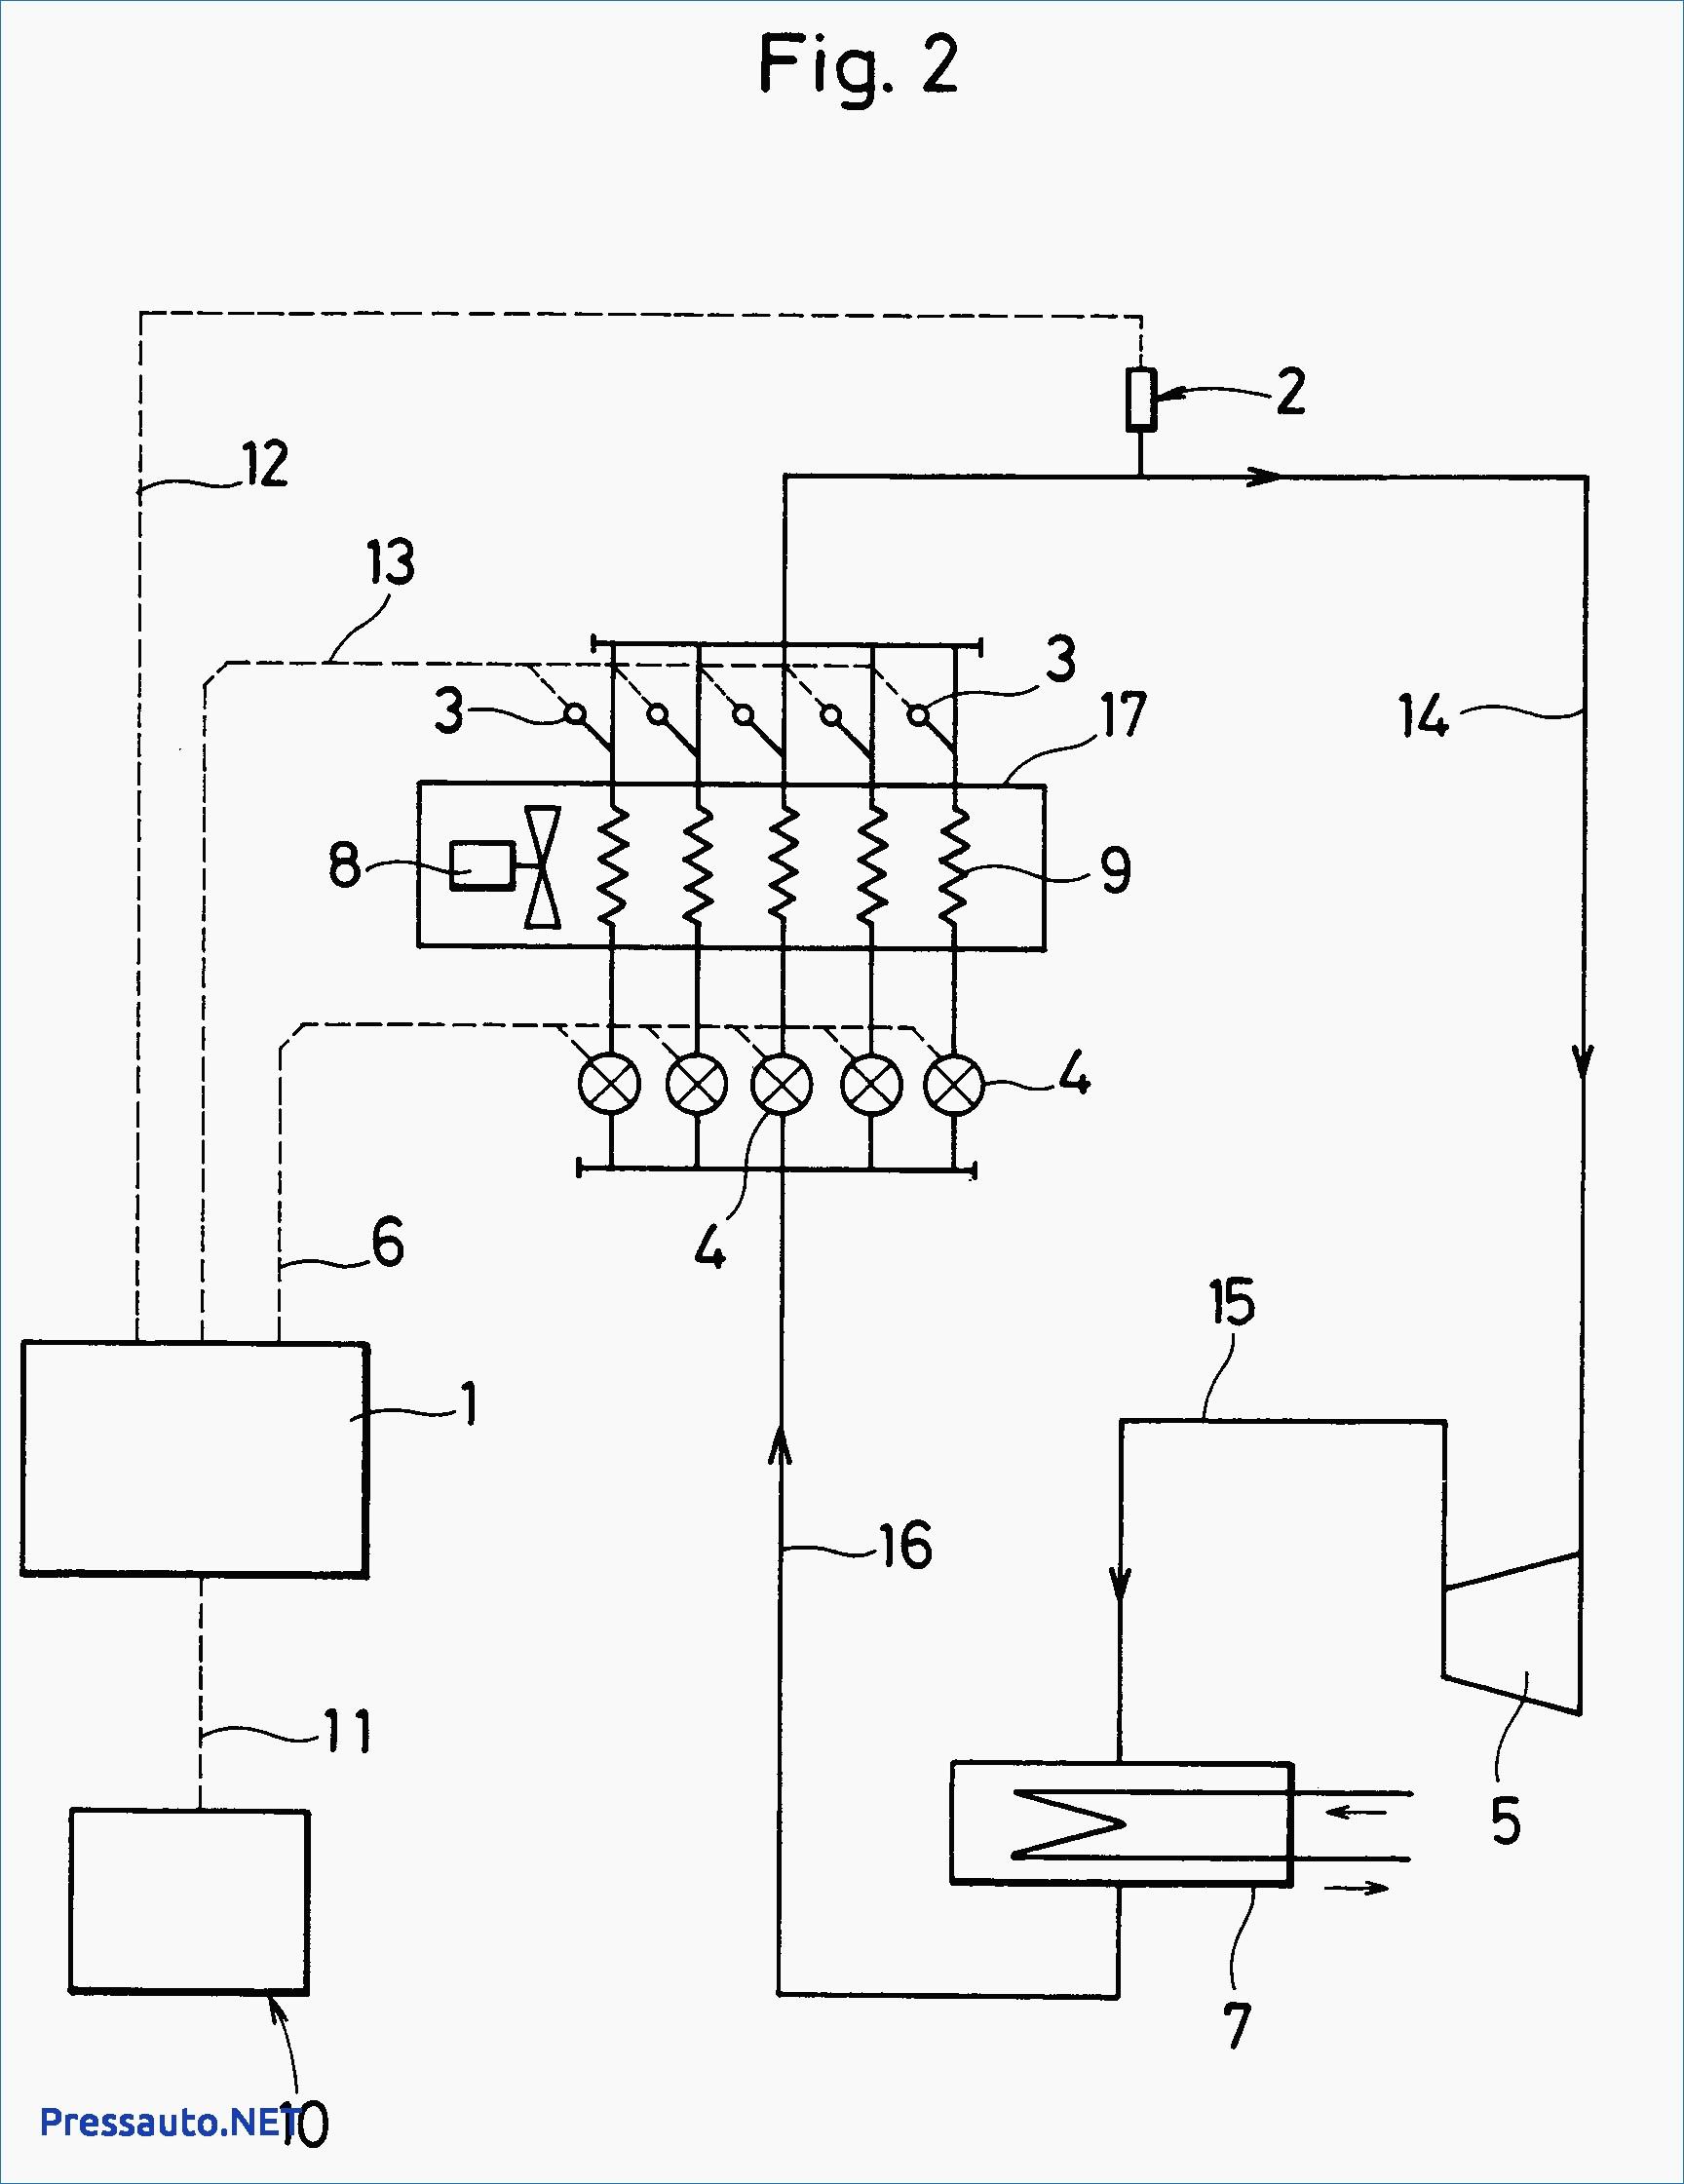 hight resolution of bohn walk in freezer wiring diagram wiring diagram amazing heatcraft refrigeration diagrams for freezer with